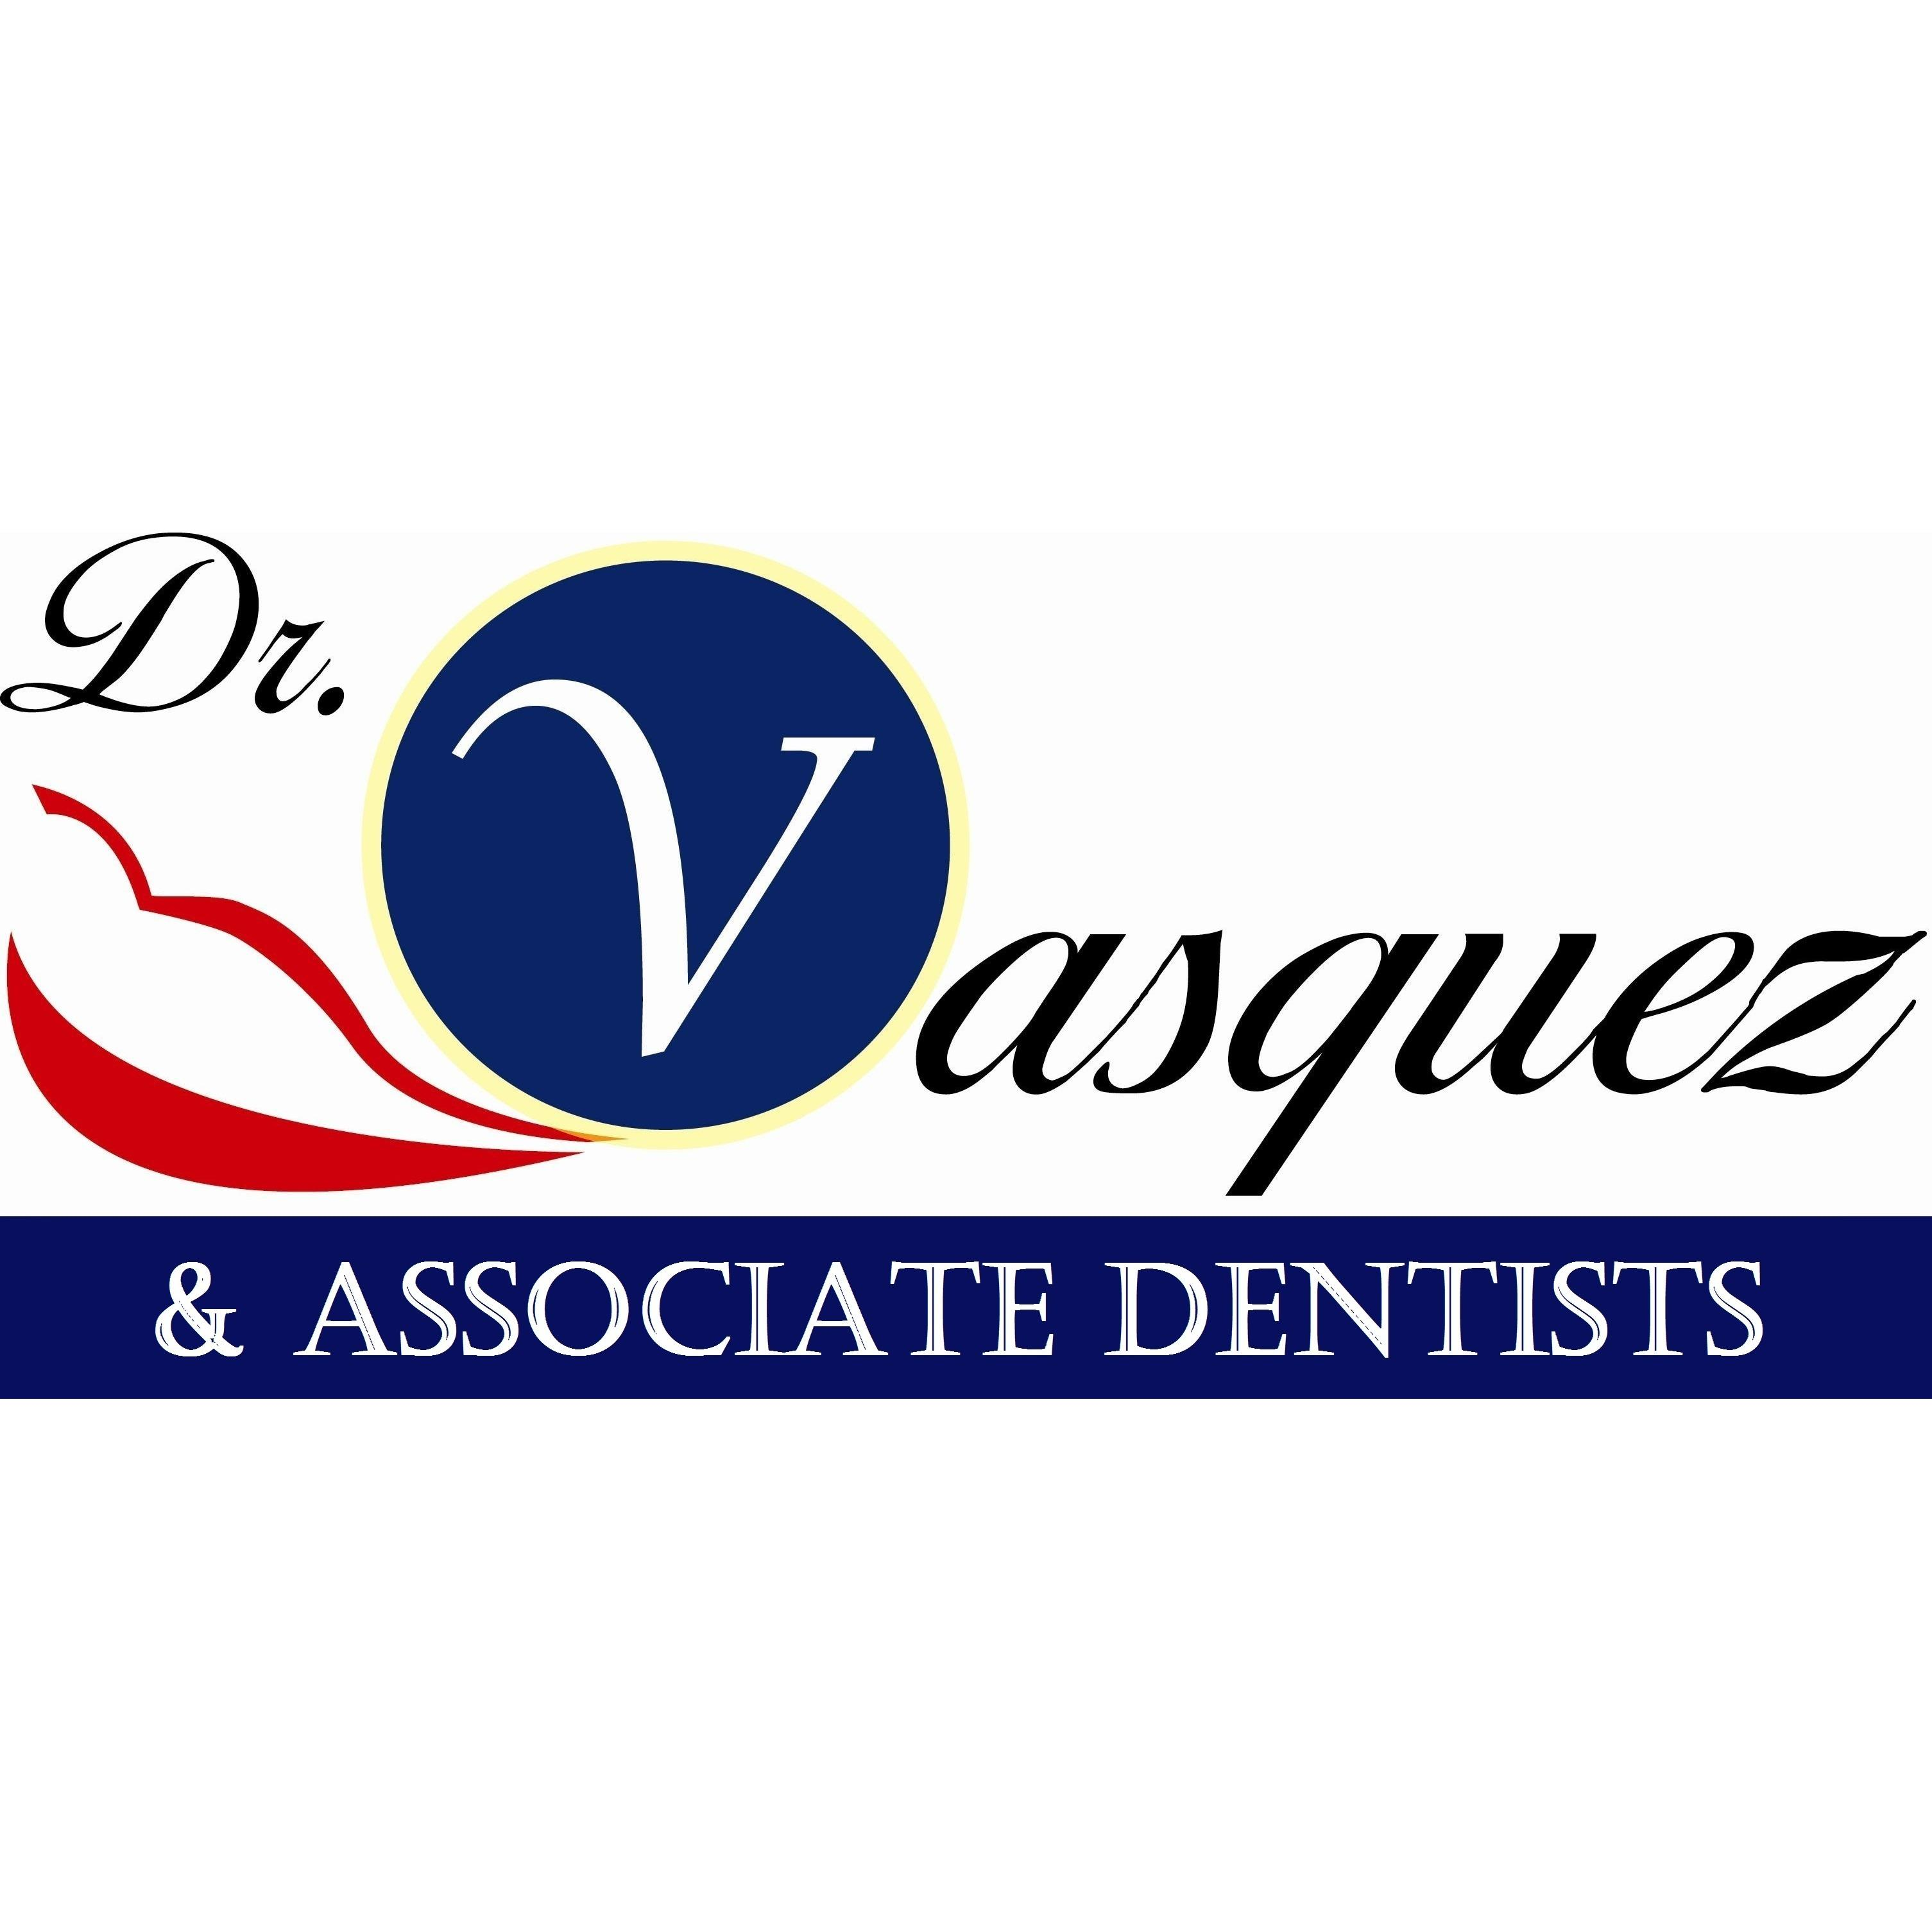 Daniel Vasquez DDS & Associates